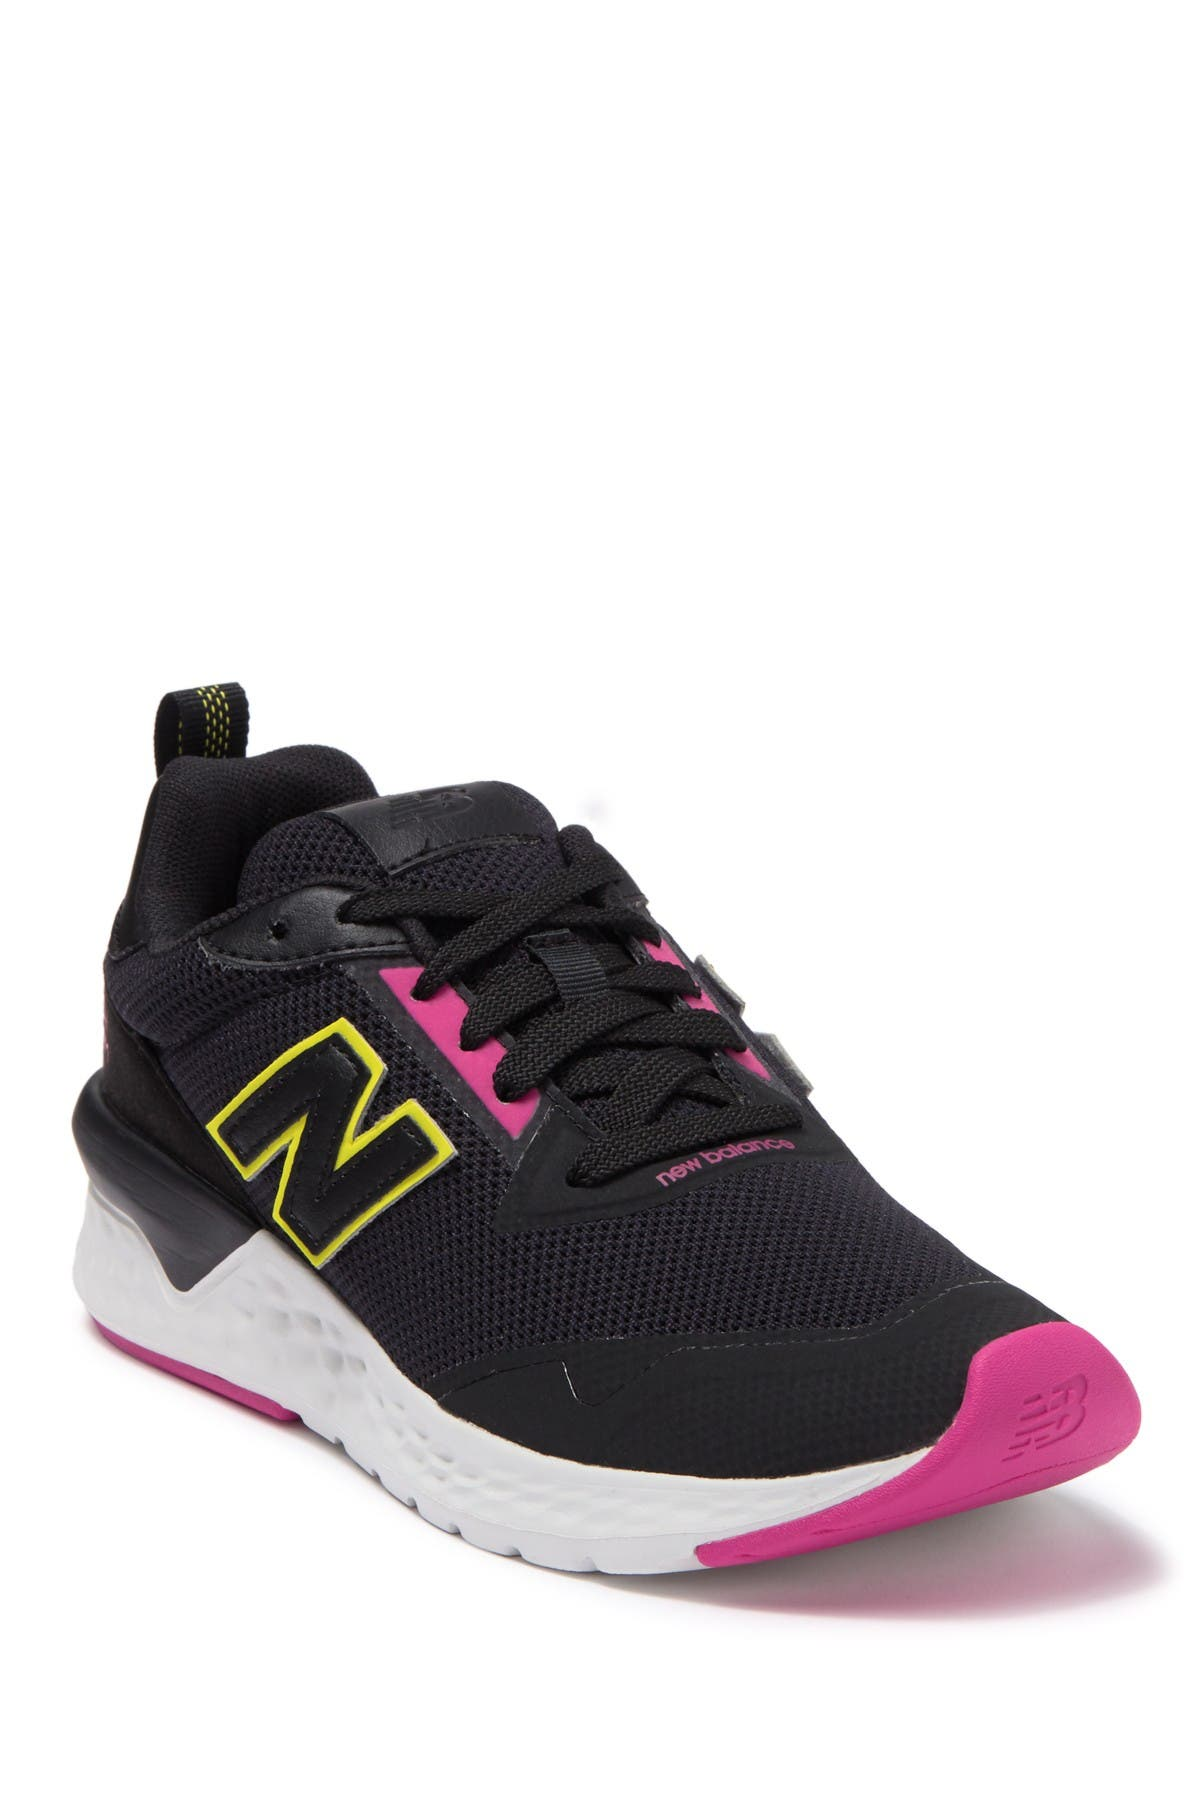 Image of New Balance Classic 515v2 Sneaker